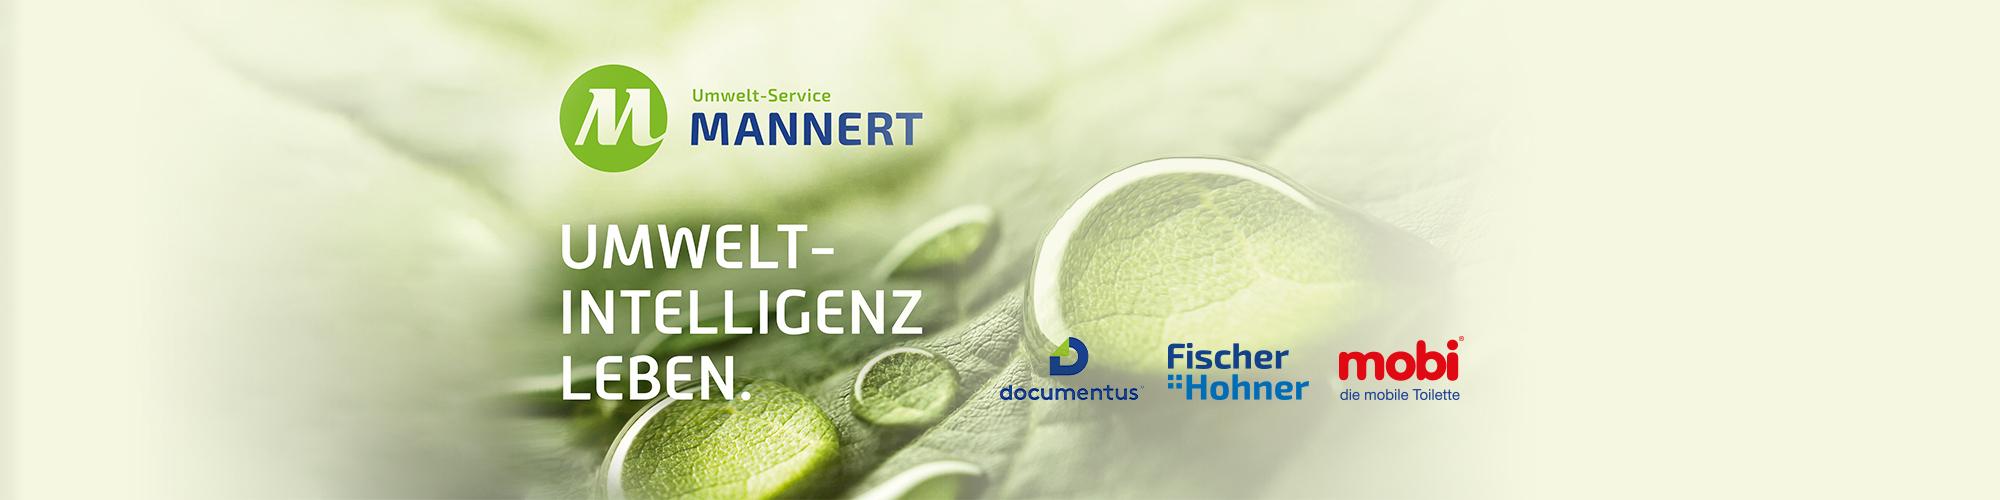 UMSEMA - Umwelt Service Mannert GmbH